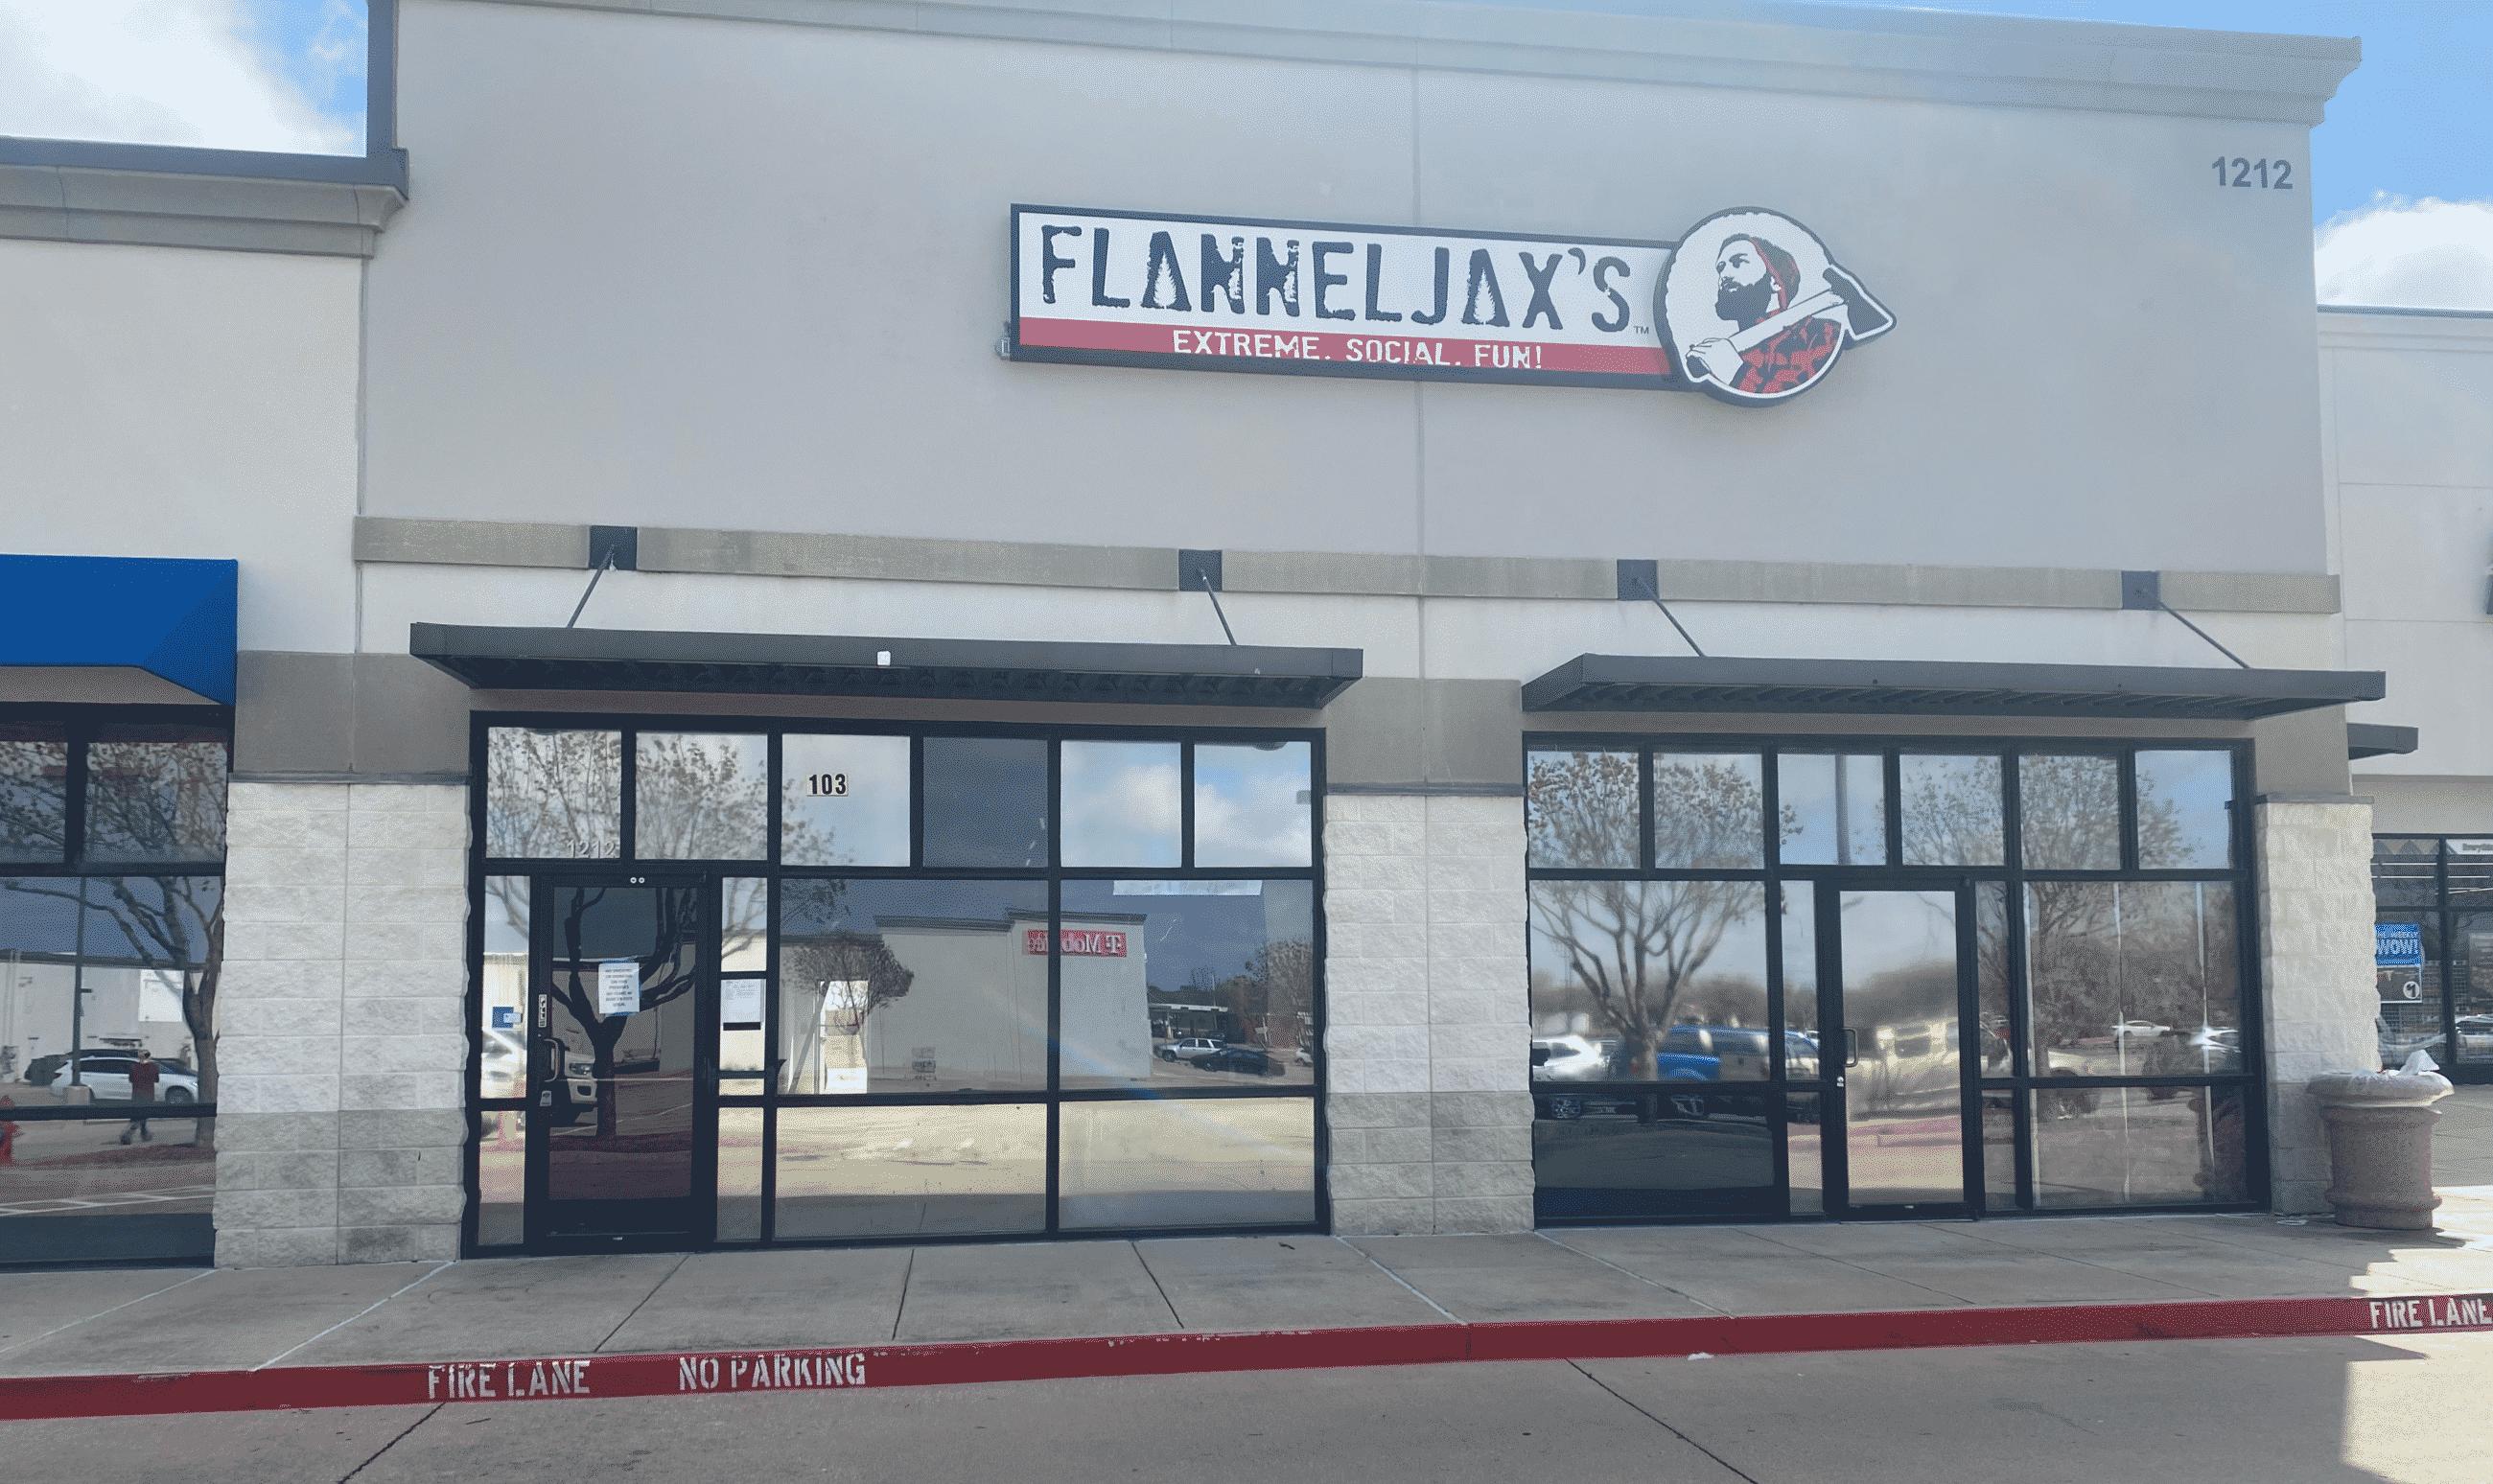 FlannelJax's Fort Worth (Roanoke) store front